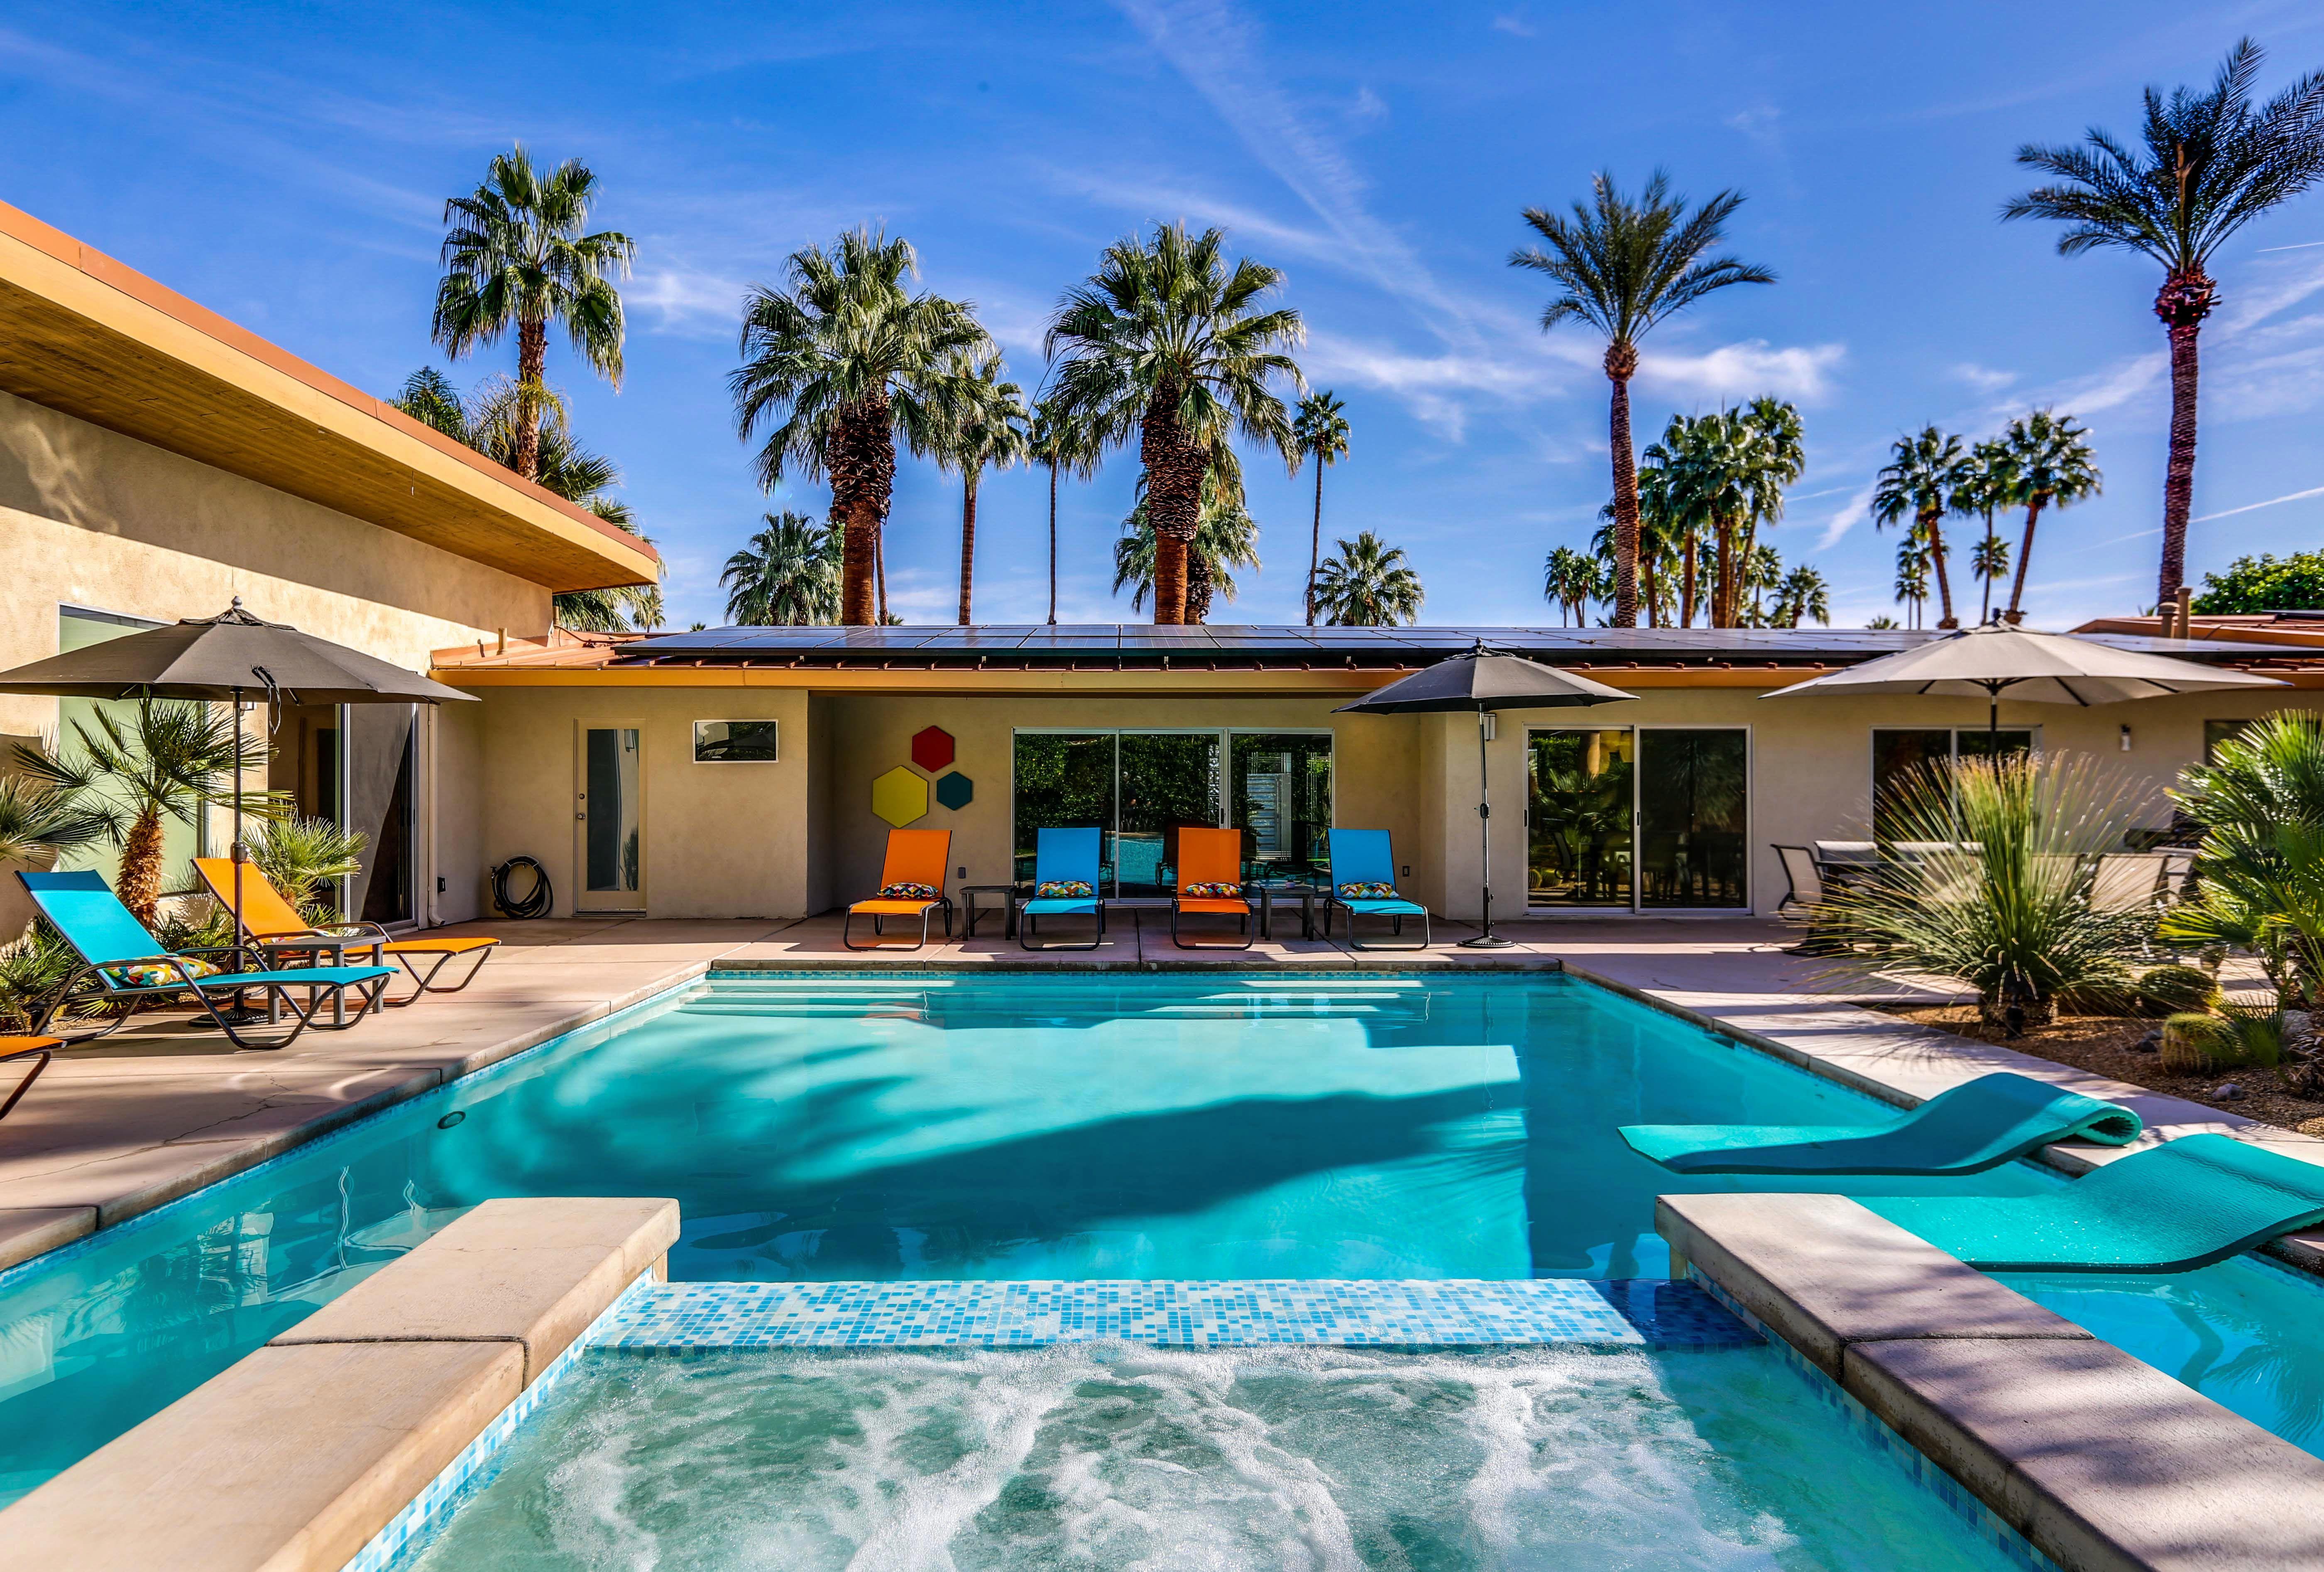 pin vacation palm springs